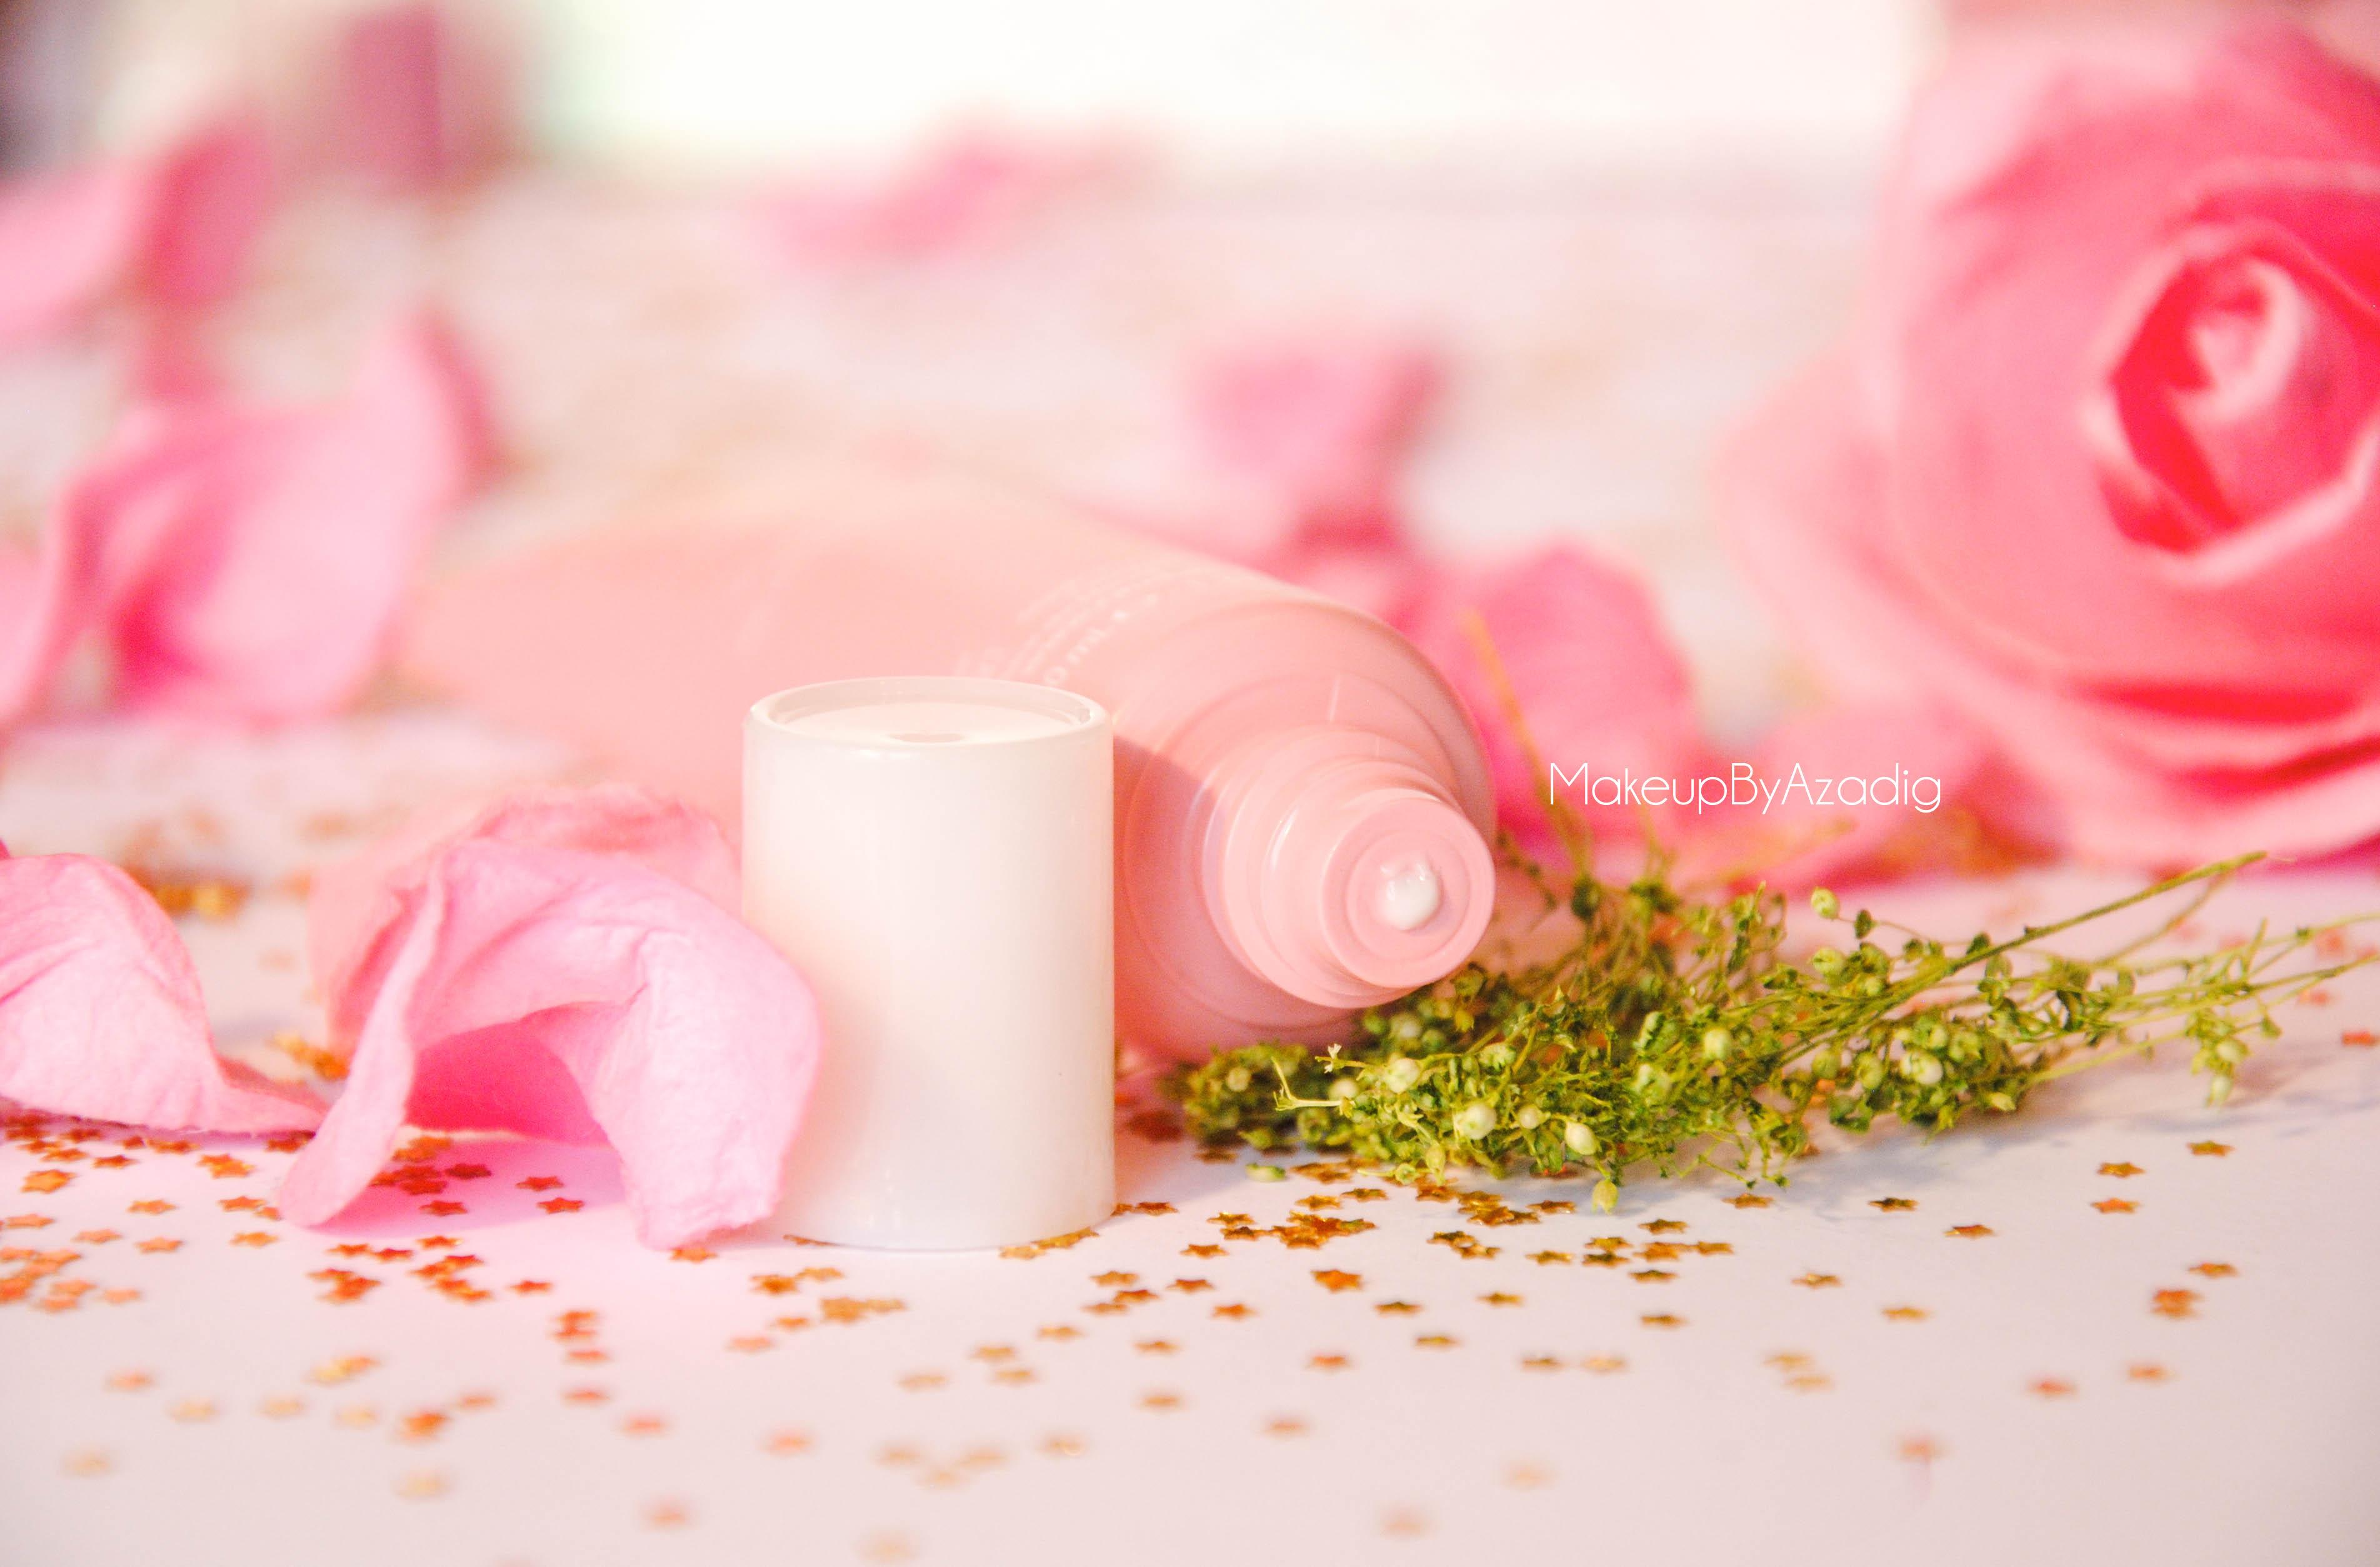 creme hydratante vinosource caudalie avis revue doctipharma makeupbyazadig texture